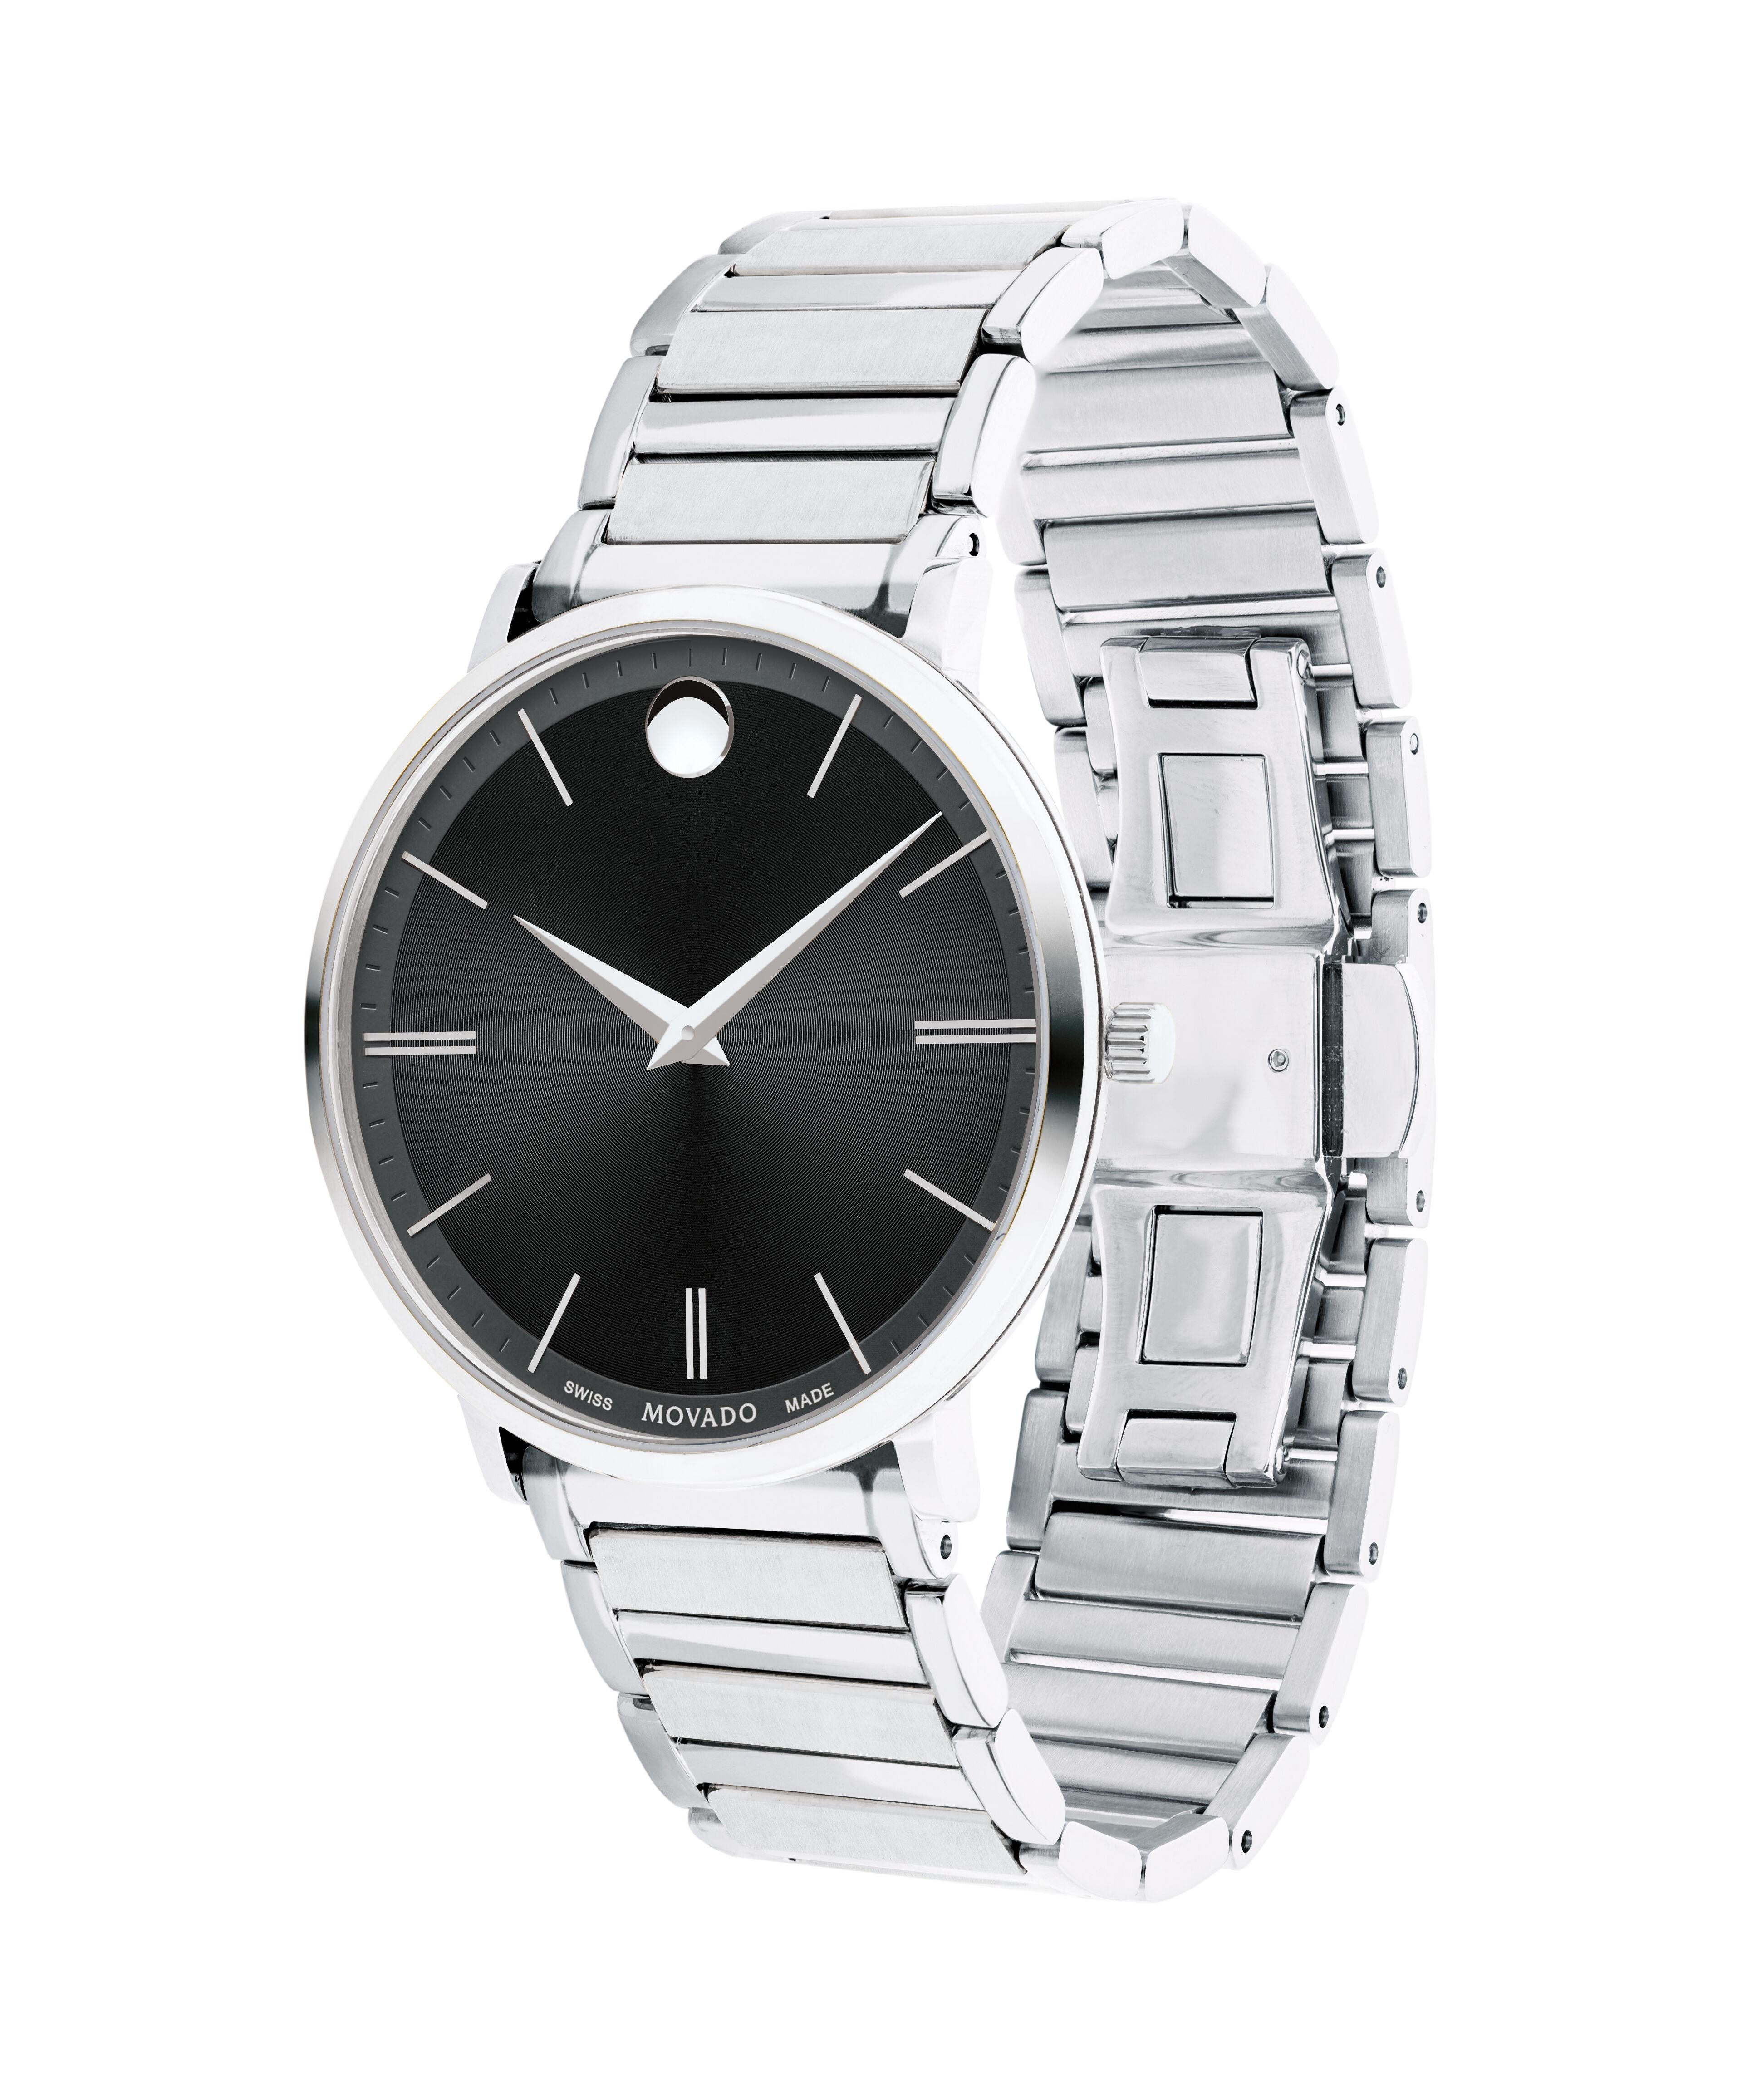 Panerai Luminor Men's Watch Replica